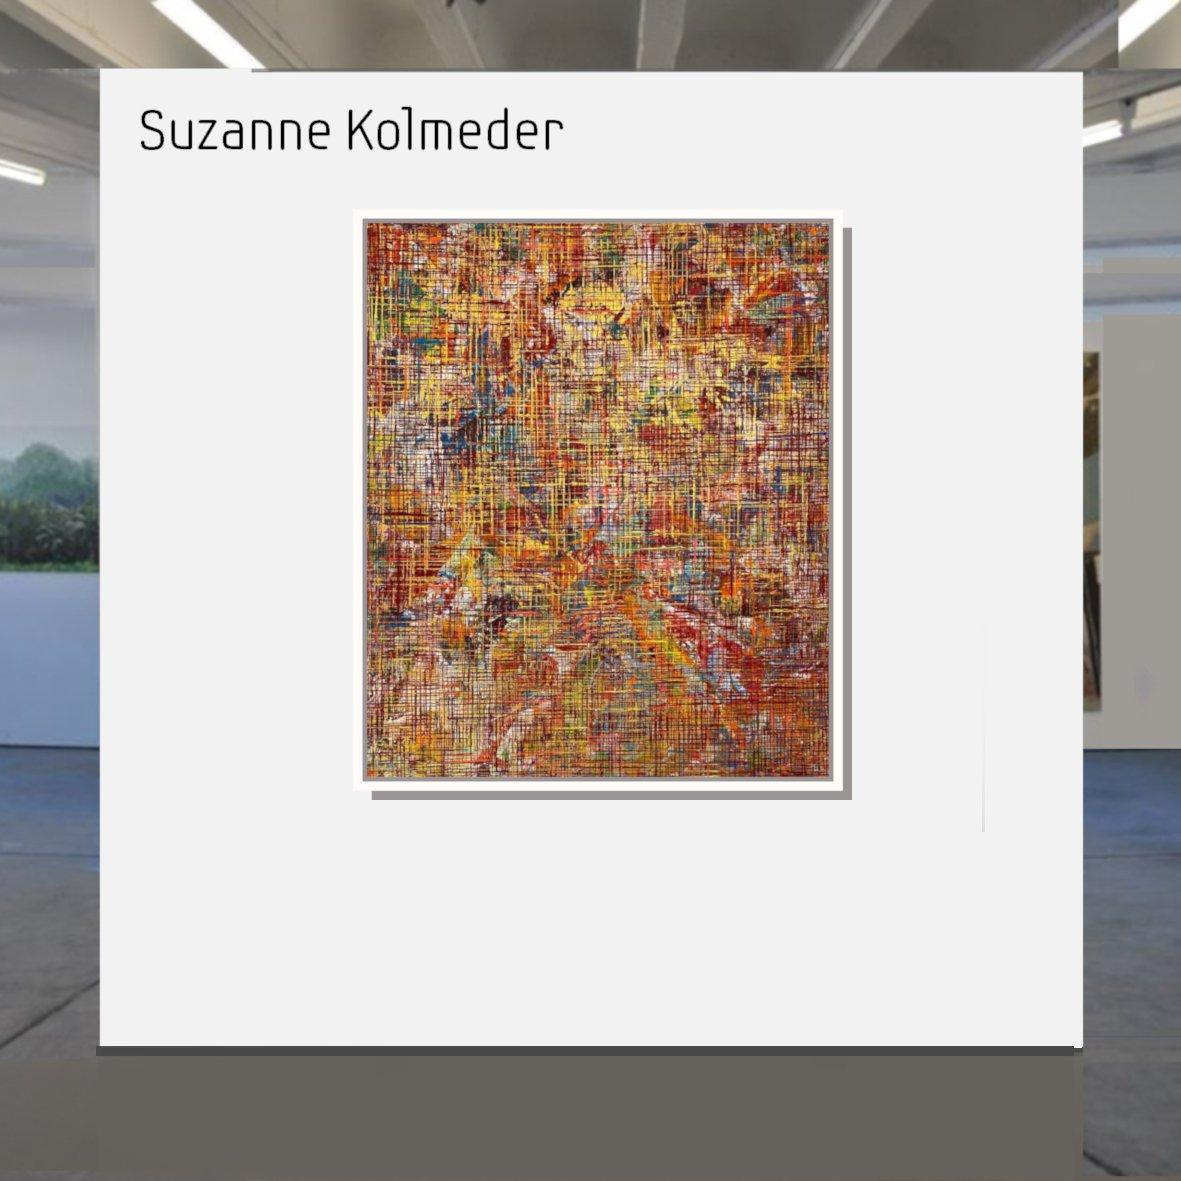 Maske_Suzanne_Kolmeder_Networks._No_31_2019_100_x_120_cm_mit_Rahmen